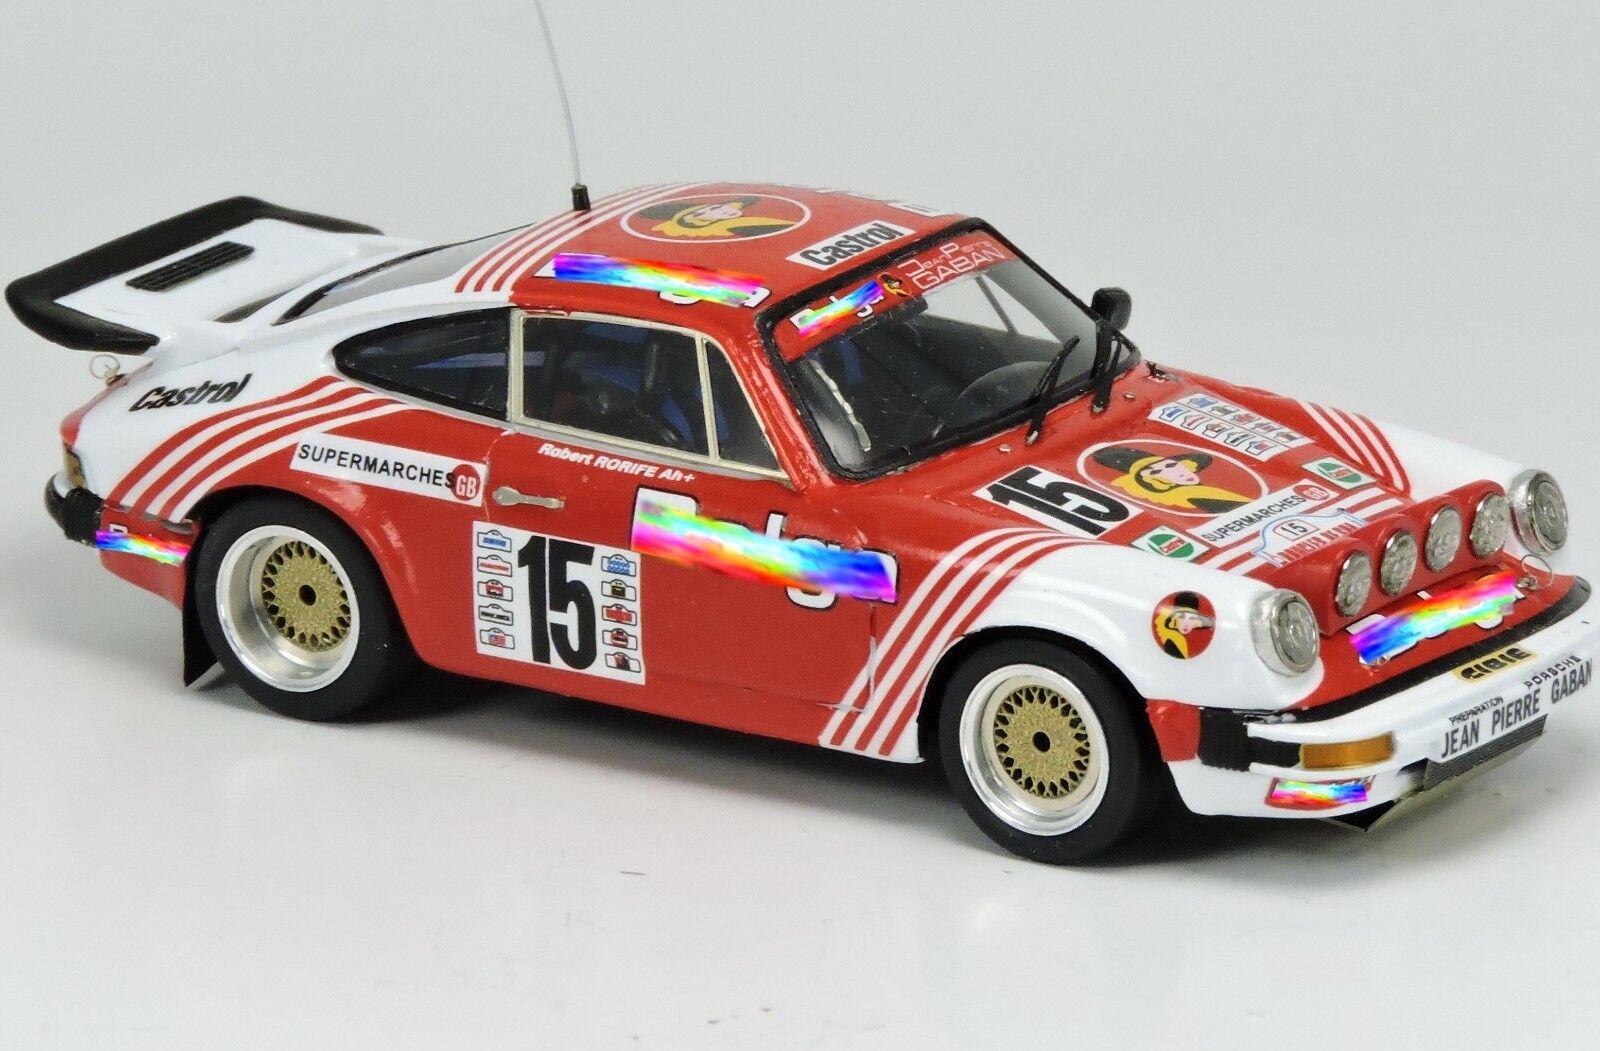 Kit Porsche 911 SC GR.4 Team Belga  15 Boucles De SPA 1980 - Arena kit 1 43